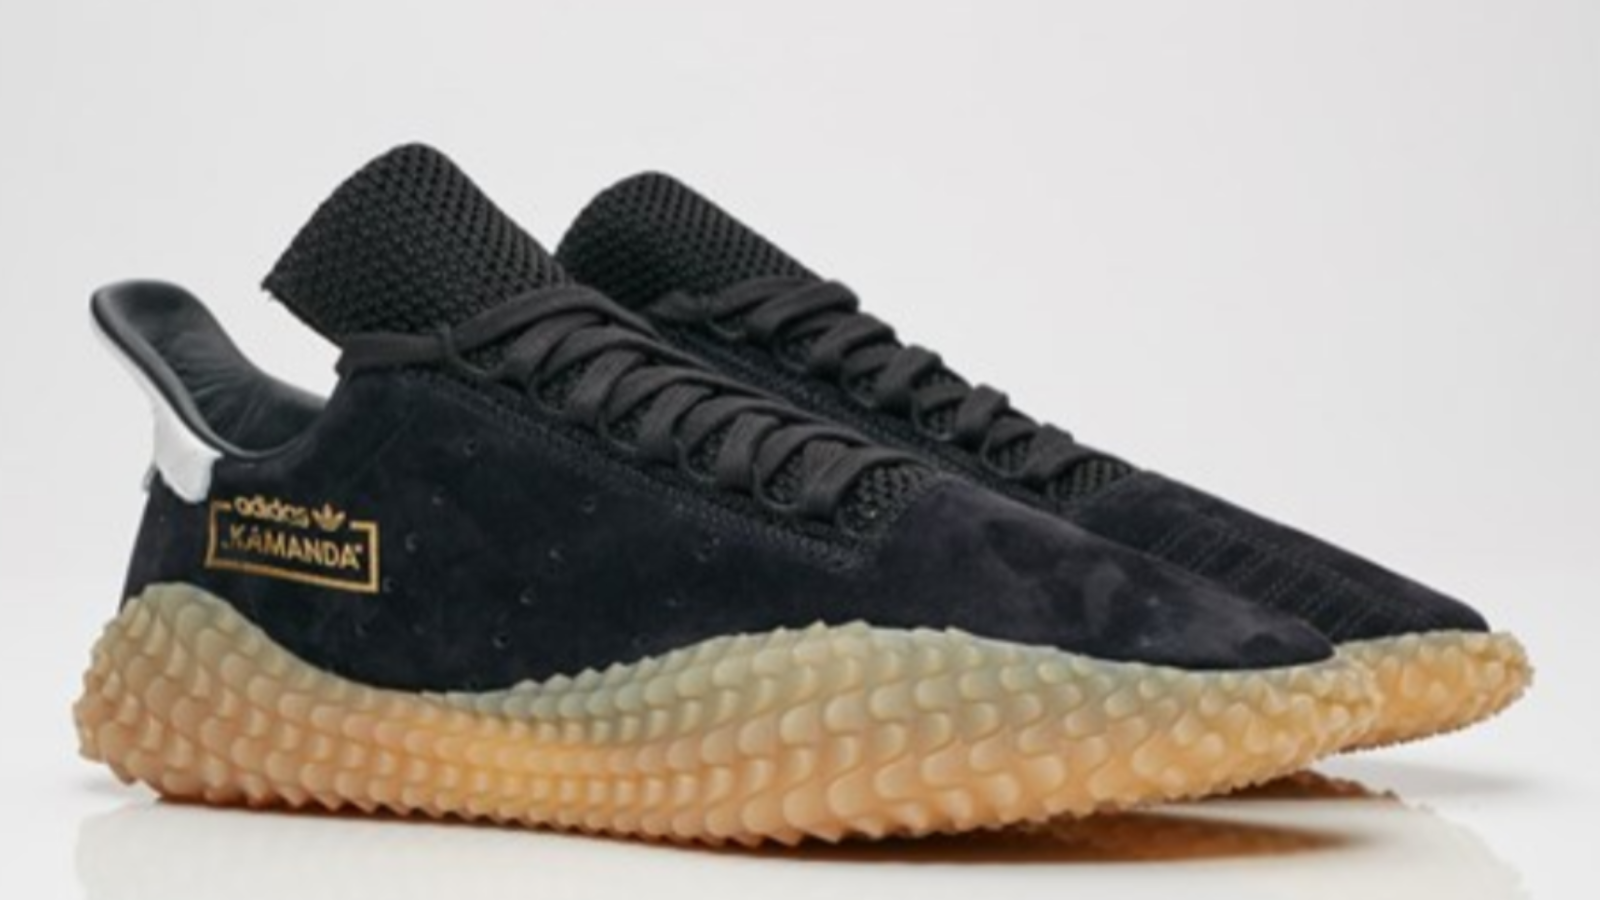 Adidas kamanda originals kamanda Adidas kern schwarz / schwarz / kaugummi cq2220 mens lifestyle - schuh - 7 - 13 223bdc